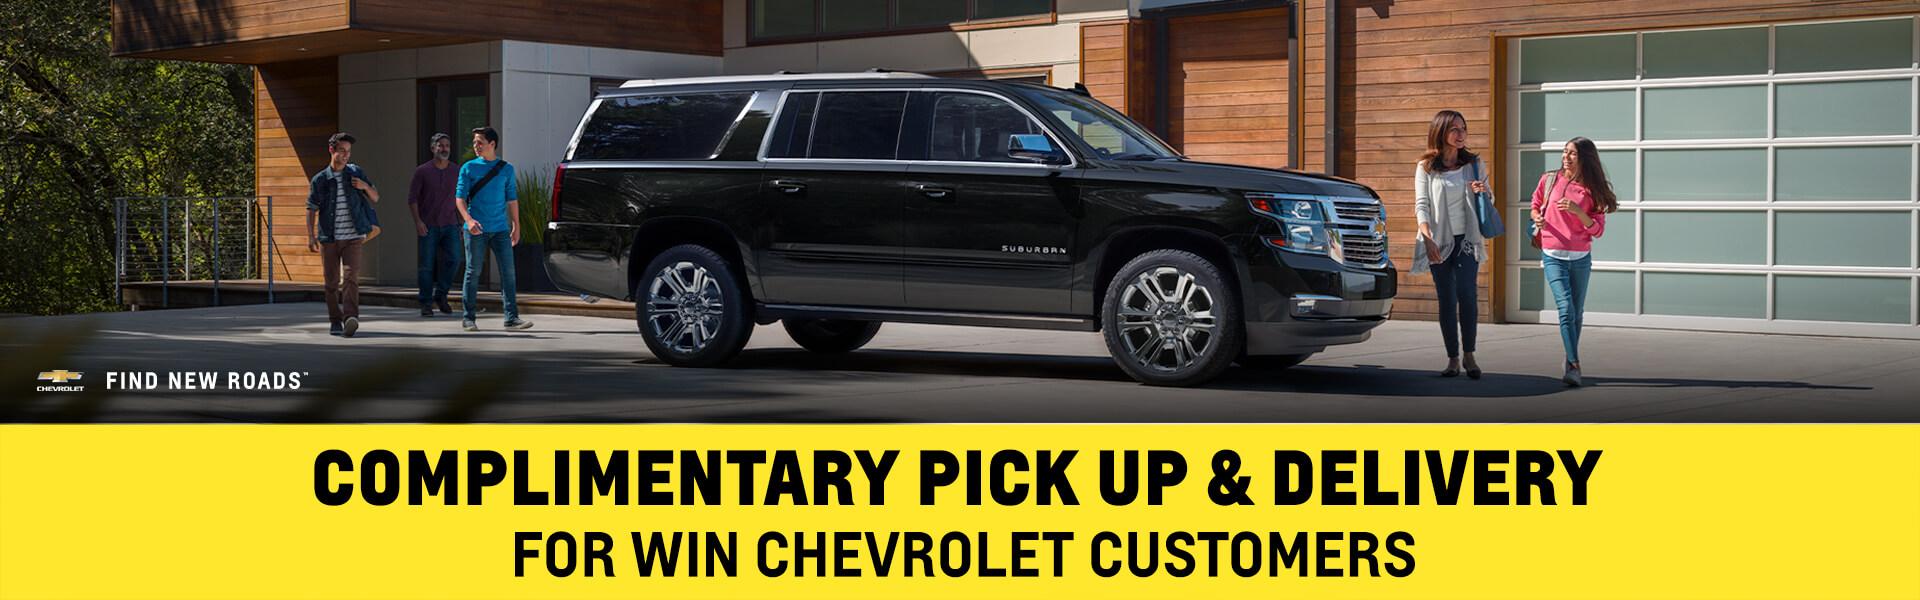 New Used Chevrolet Dealer Long Beach Torrance Los Angeles Win Chevrolet